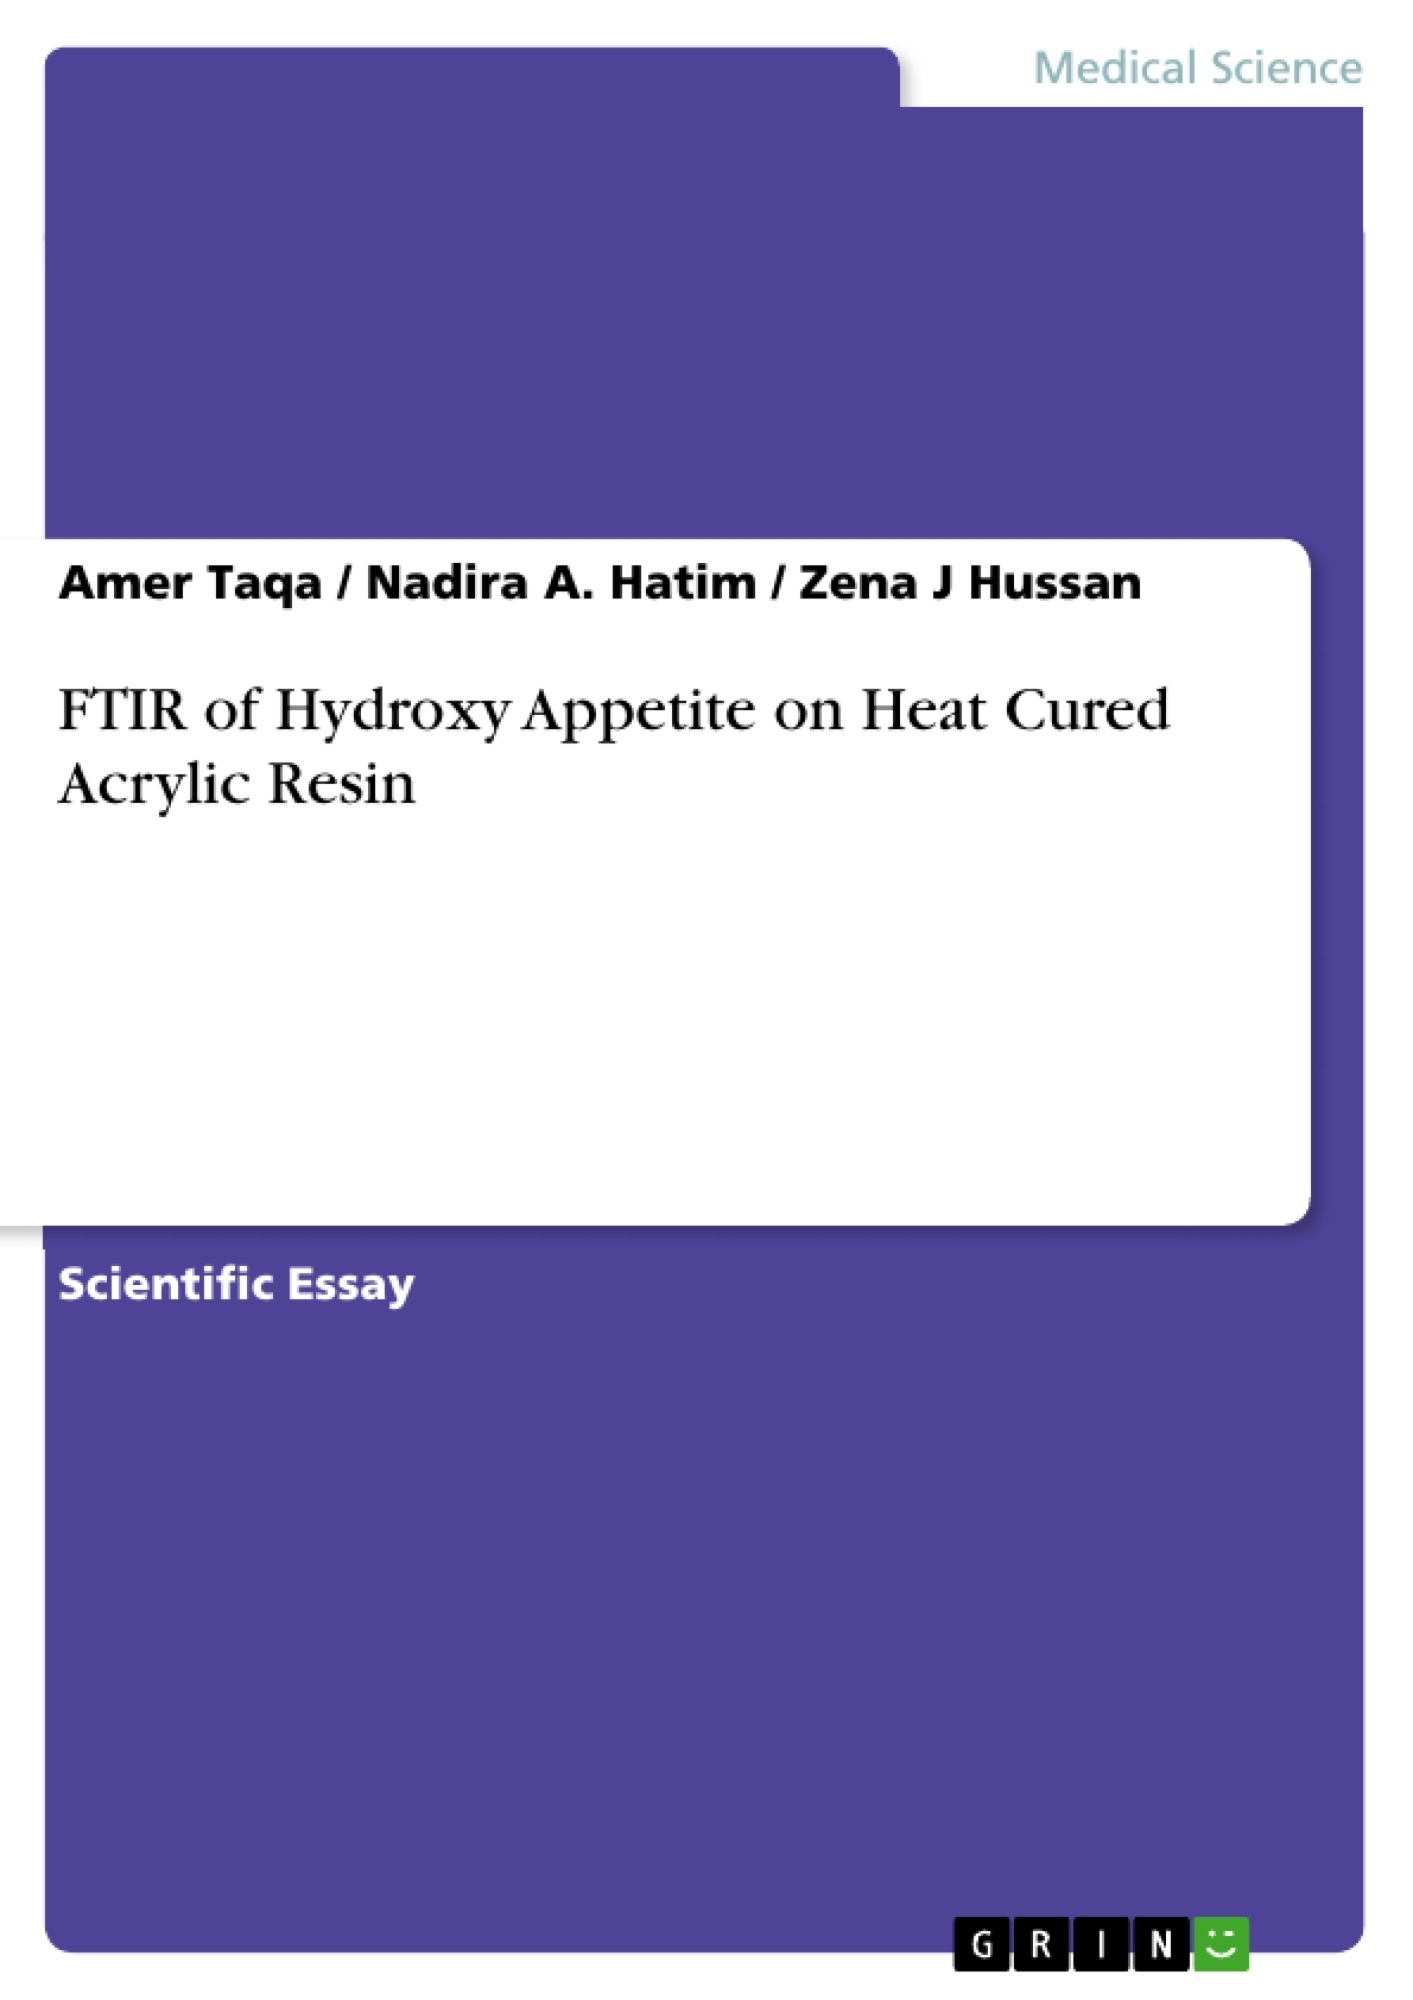 Title: FTIR of Hydroxy Appetite on Heat Cured Acrylic Resin